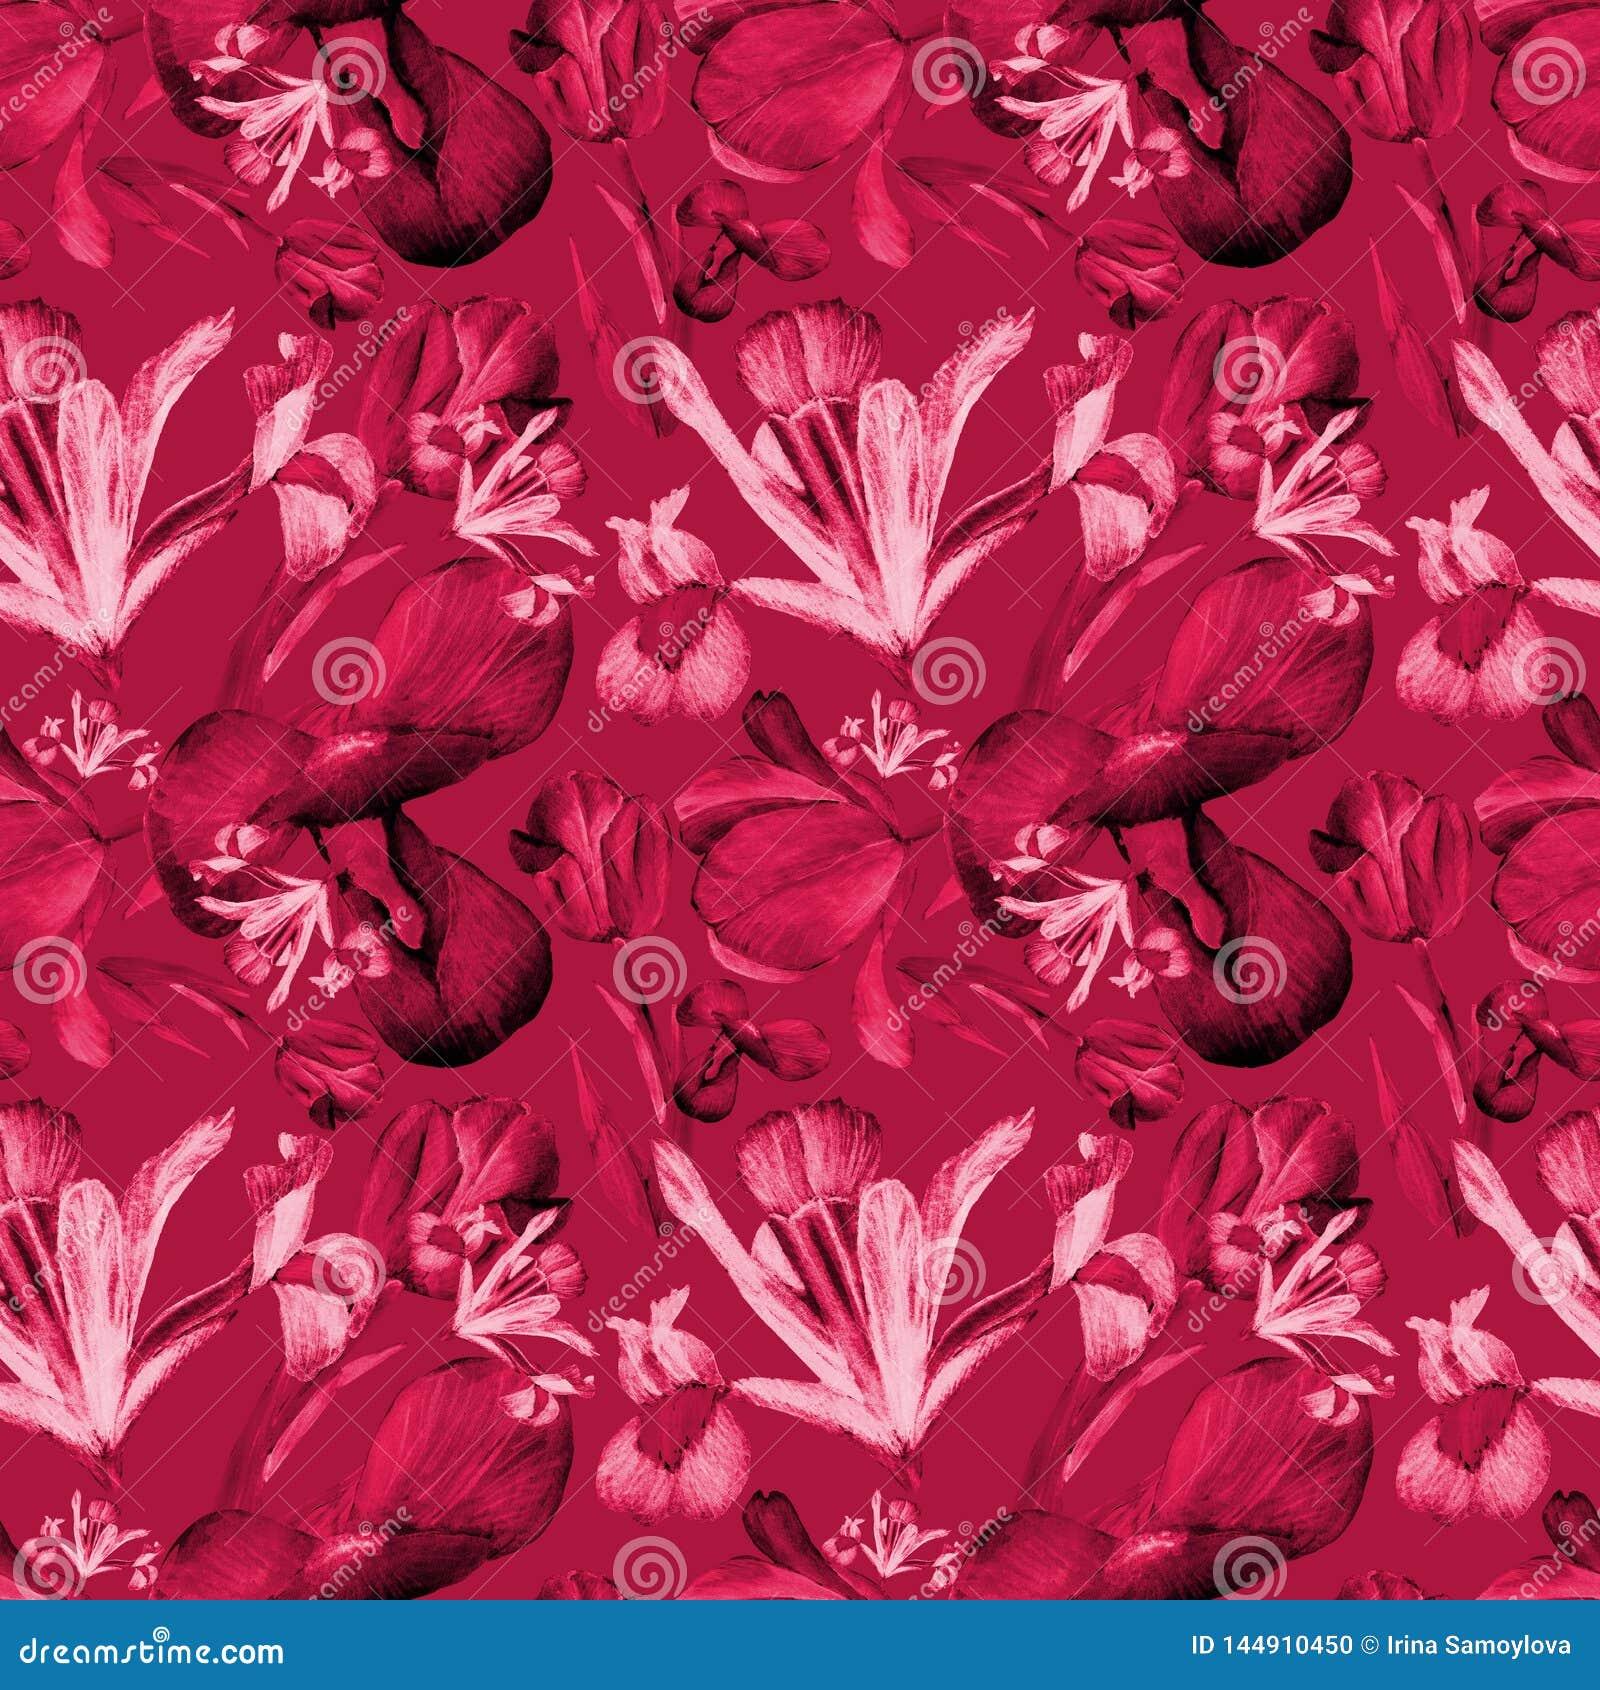 Aquarelliris und nahtloses Musterrot der Tulpen